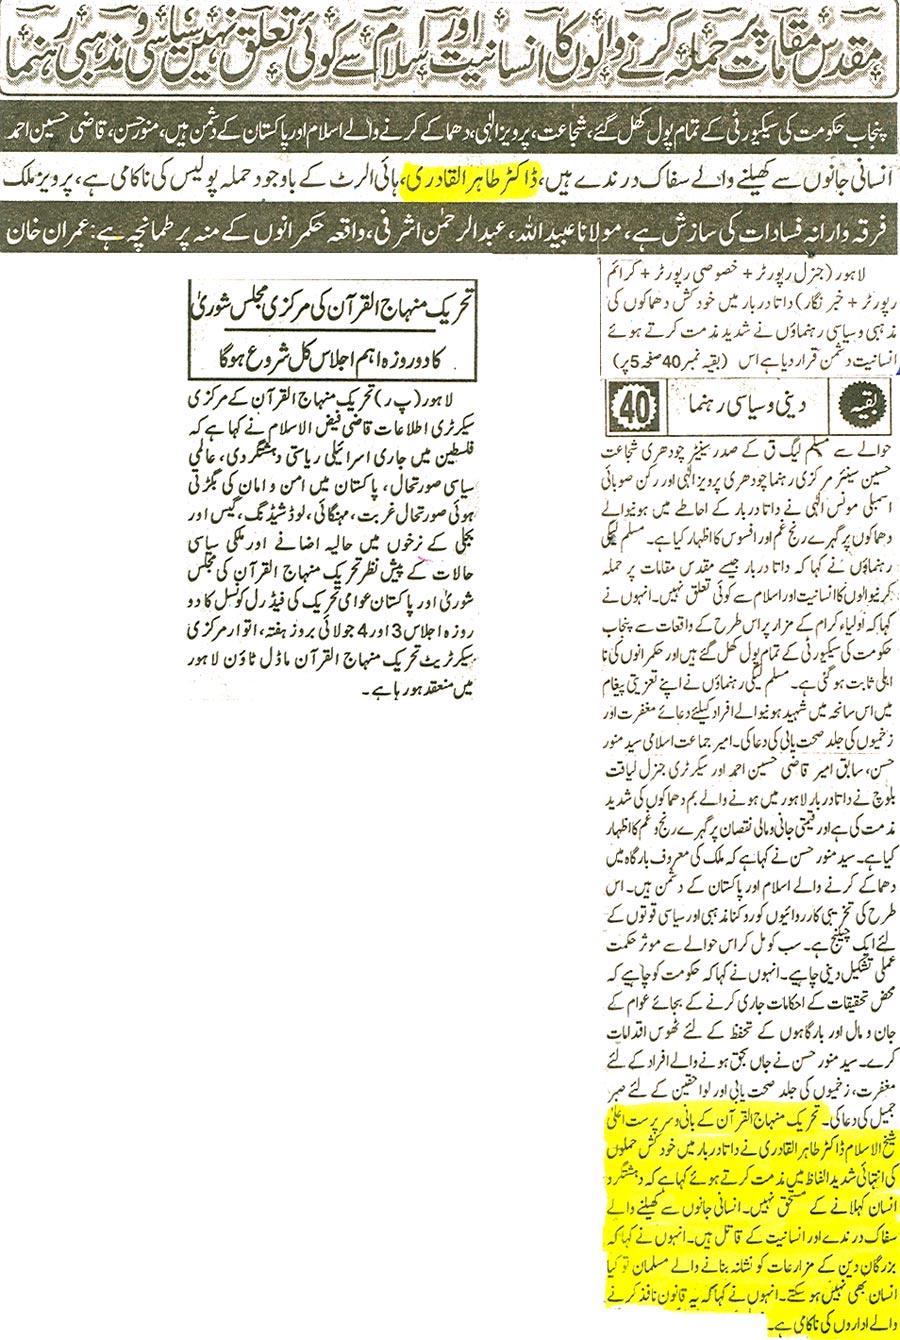 Minhaj-ul-Quran  Print Media Coverage Daily Pakistan Front Page